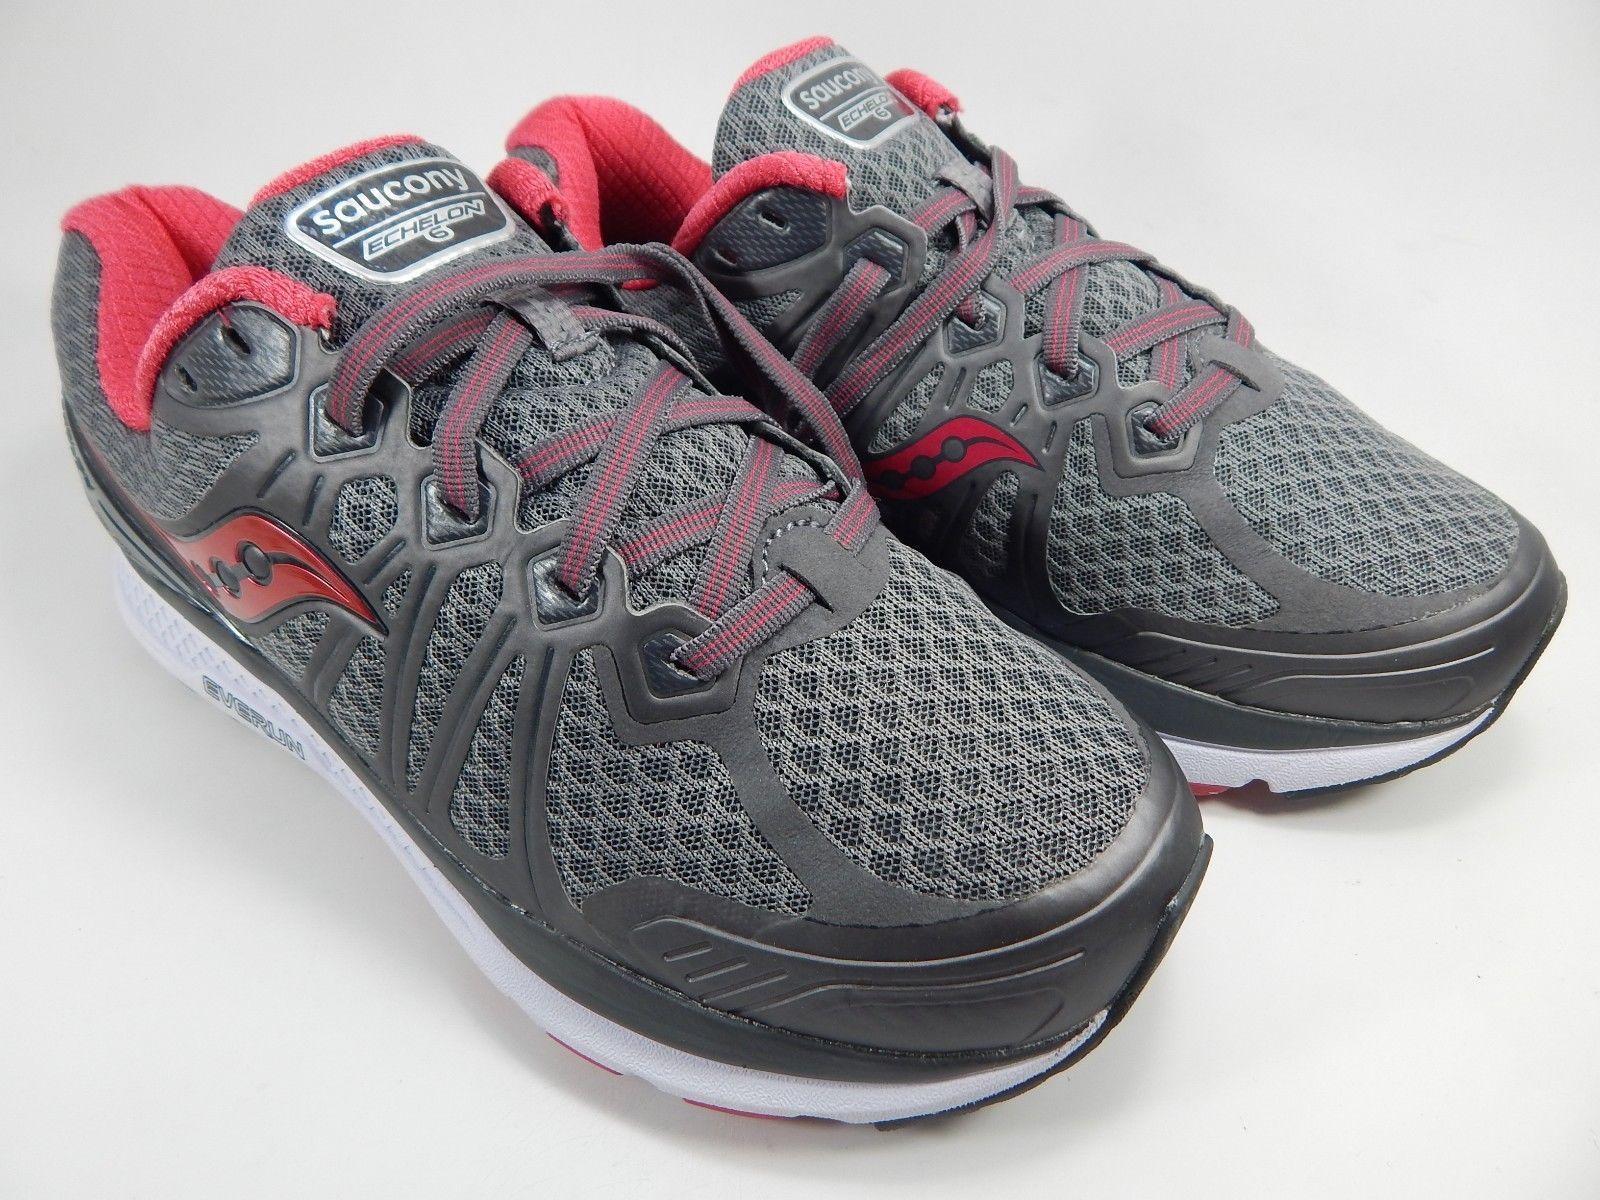 Saucony Echelon 6 Running Shoes Women's Size US 9 D (W) WIDE EU 40.5 S10385-1